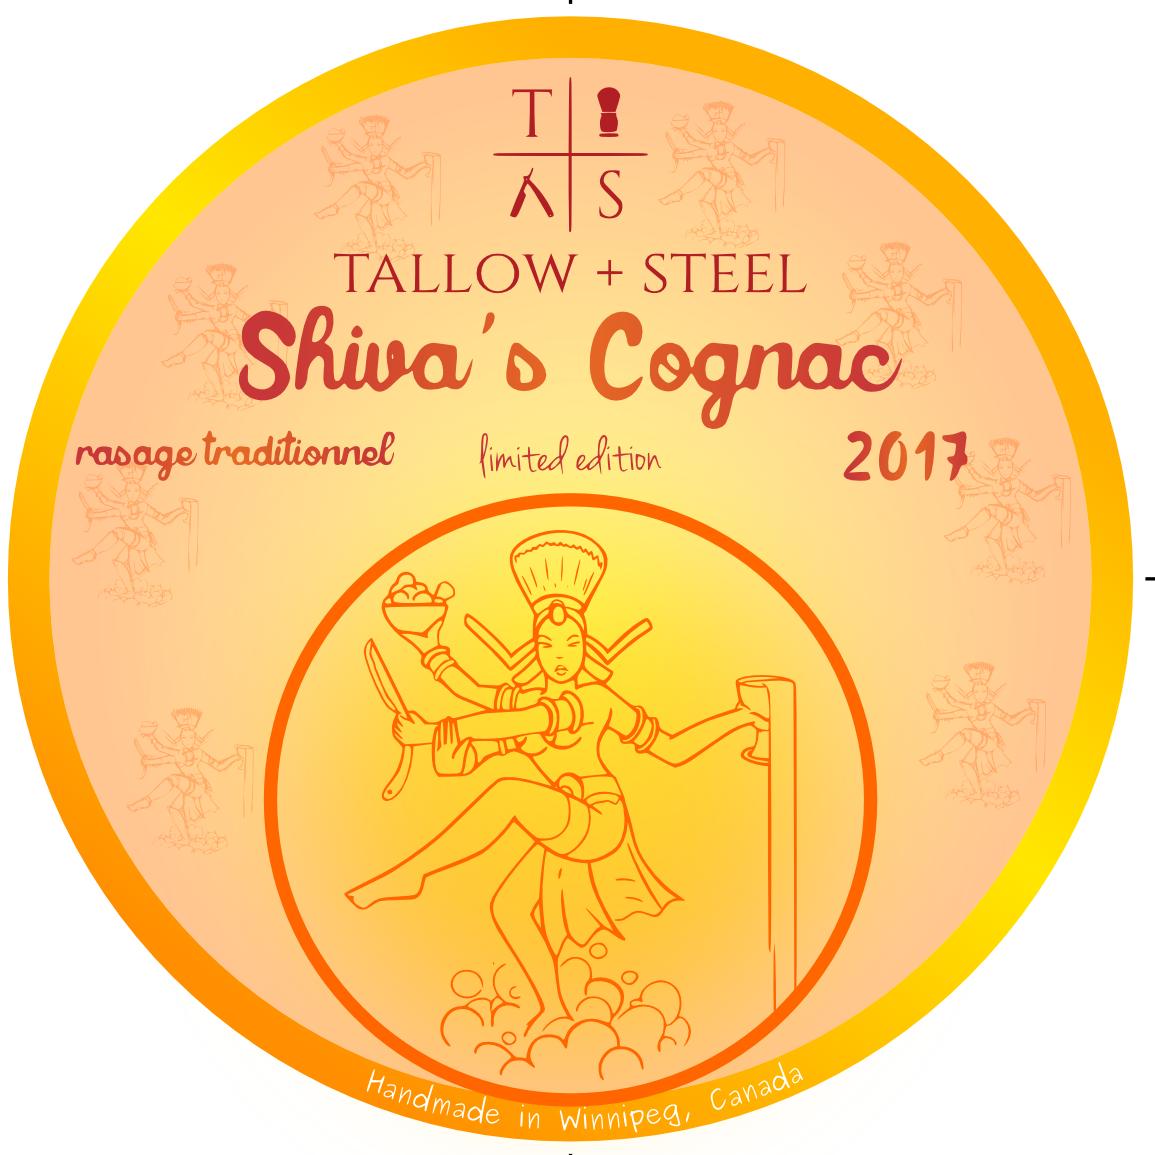 Tallow + Steel - Shiva's Cognac - Soap image